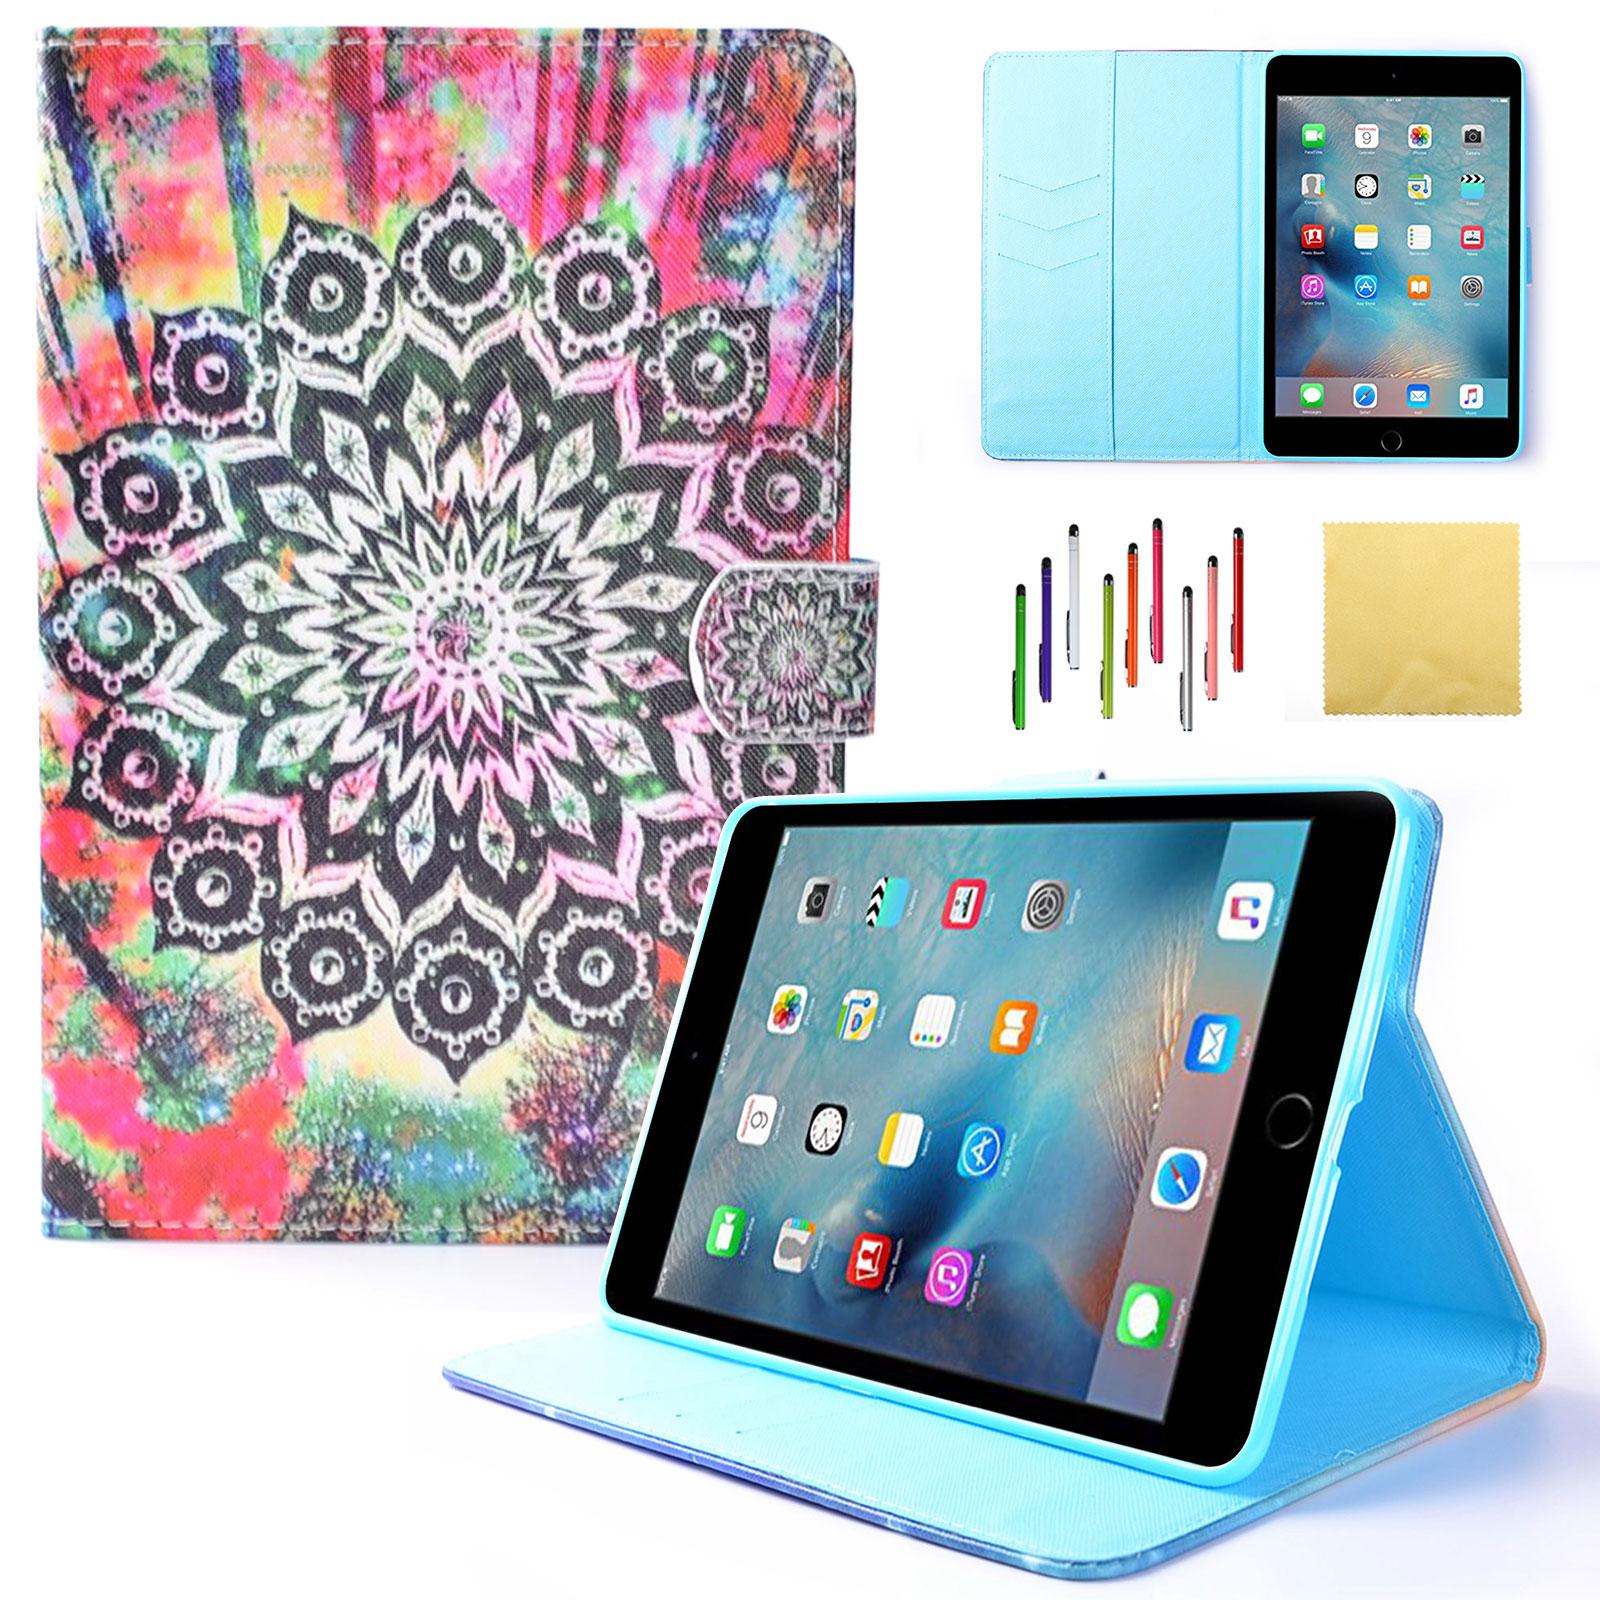 iPad Mini 3 Case, iPad Mini 2 Cover, iPad Mini Case, Goodest PU Leather Multi-Angle Viewing Folio Stand Cover with Auto Wake/Sleep for 7.9 inch iPad Mini 3 2 1 Tablet, Colorful Mandala